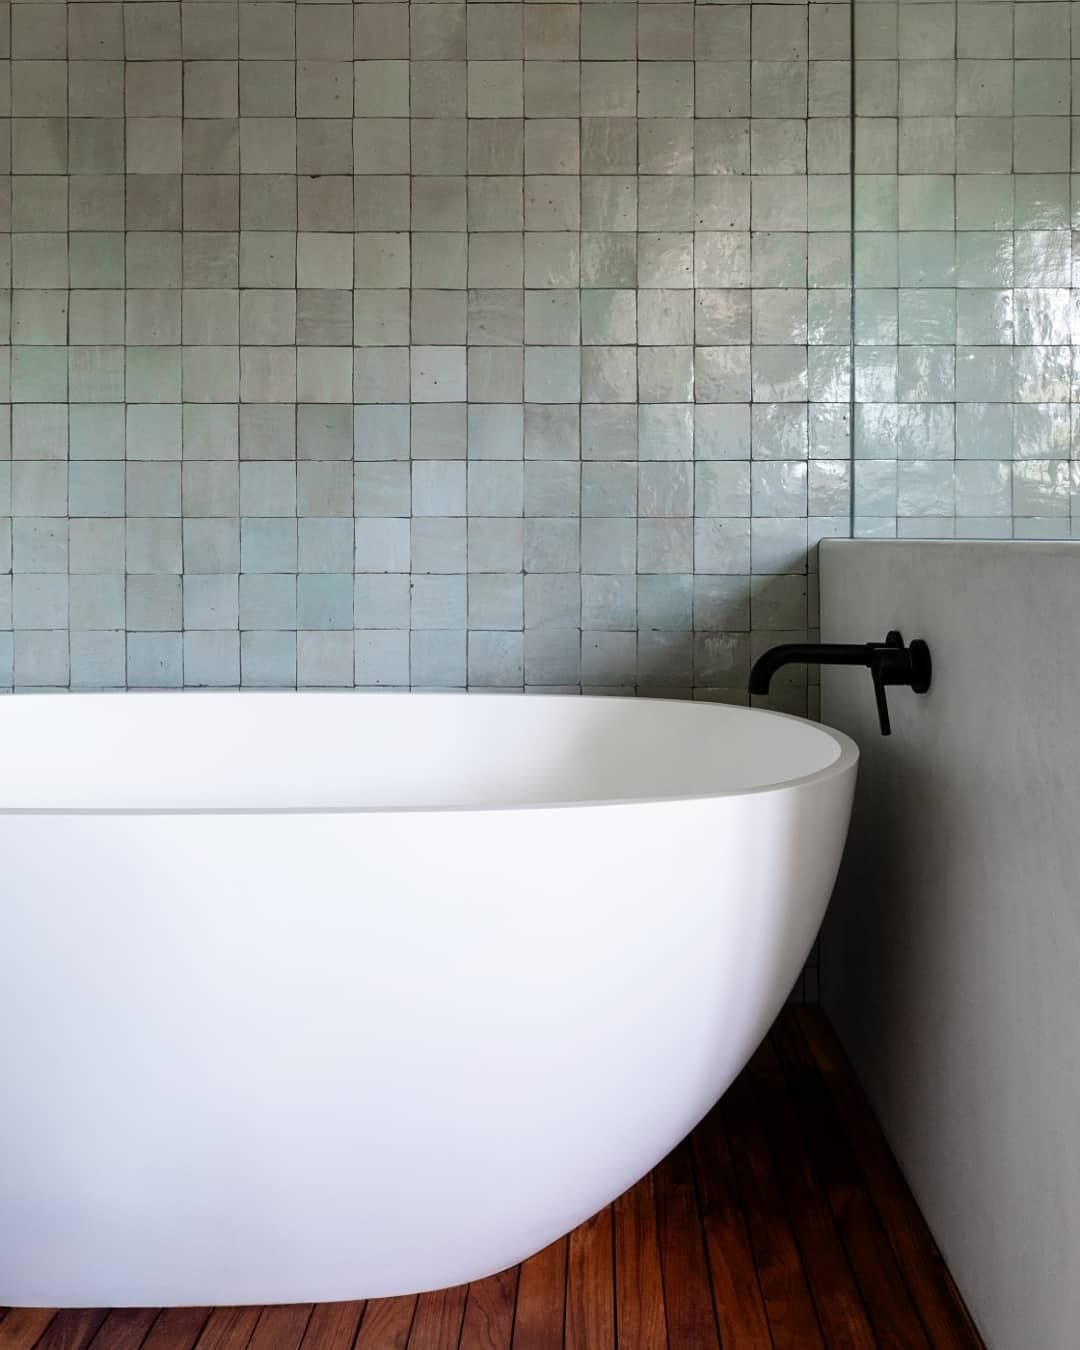 Zen bathroom design with beachy pale green cle tile and ... on green bathroom design, green bathroom sink, green ocean bathroom, green home bathroom, green spa bathroom, green modern bathroom, green orange bathroom, green white bathroom, green stone bathroom, green garden bathroom, green zebra bathroom,